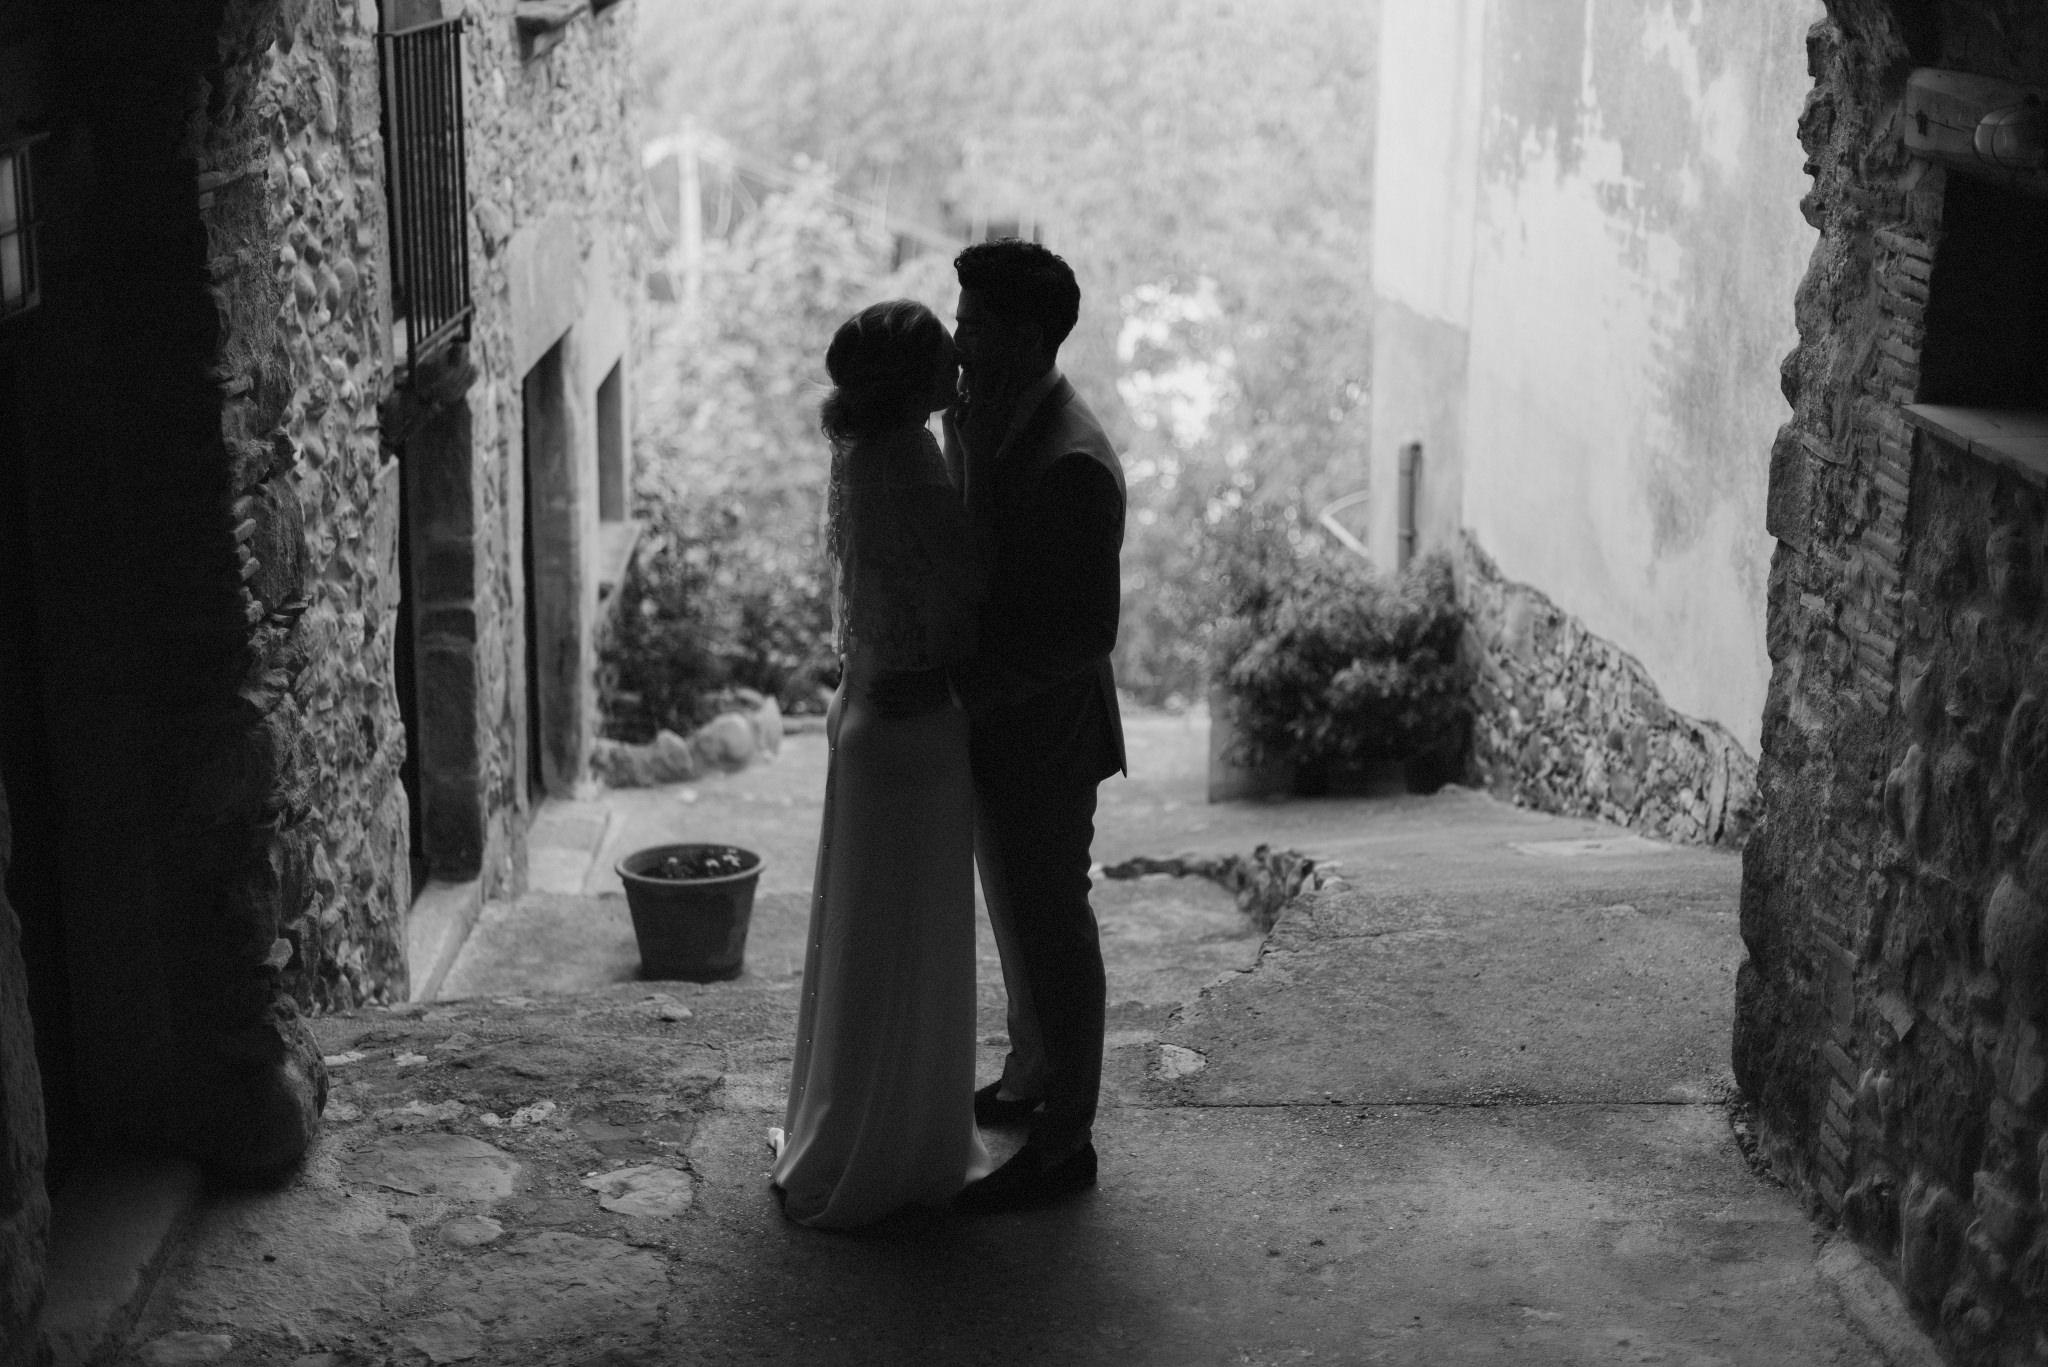 Bruidsfotograaf Spanje Castle d'Emporda destination wedding Naomi van der Kraan00061.jpg